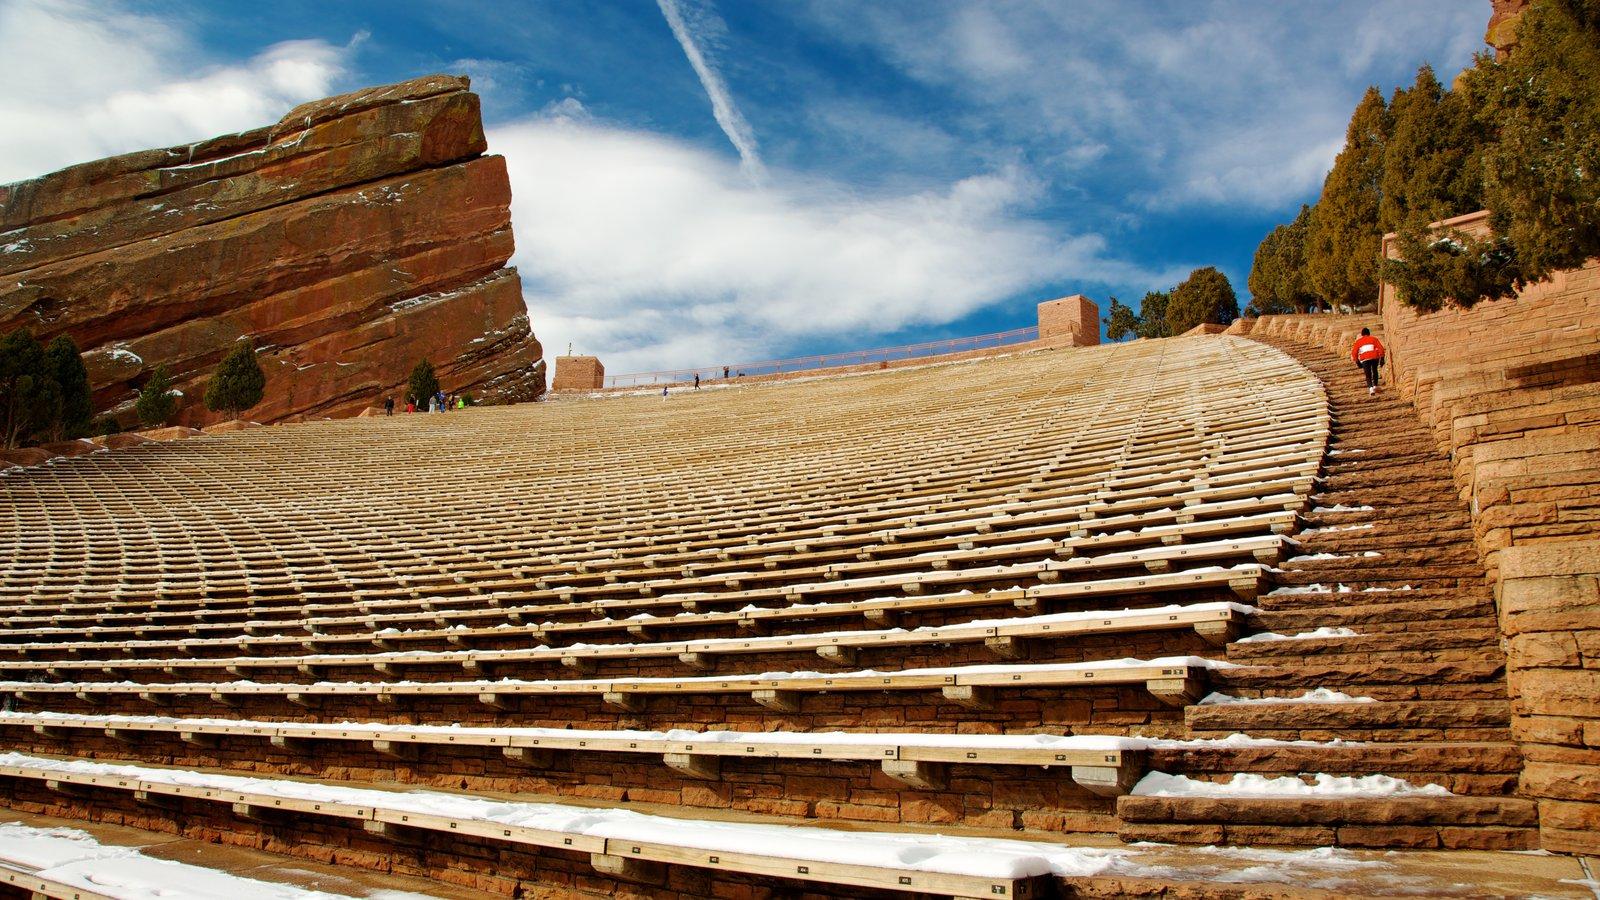 Red Rocks Amphitheater mostrando arquitetura de patrimônio